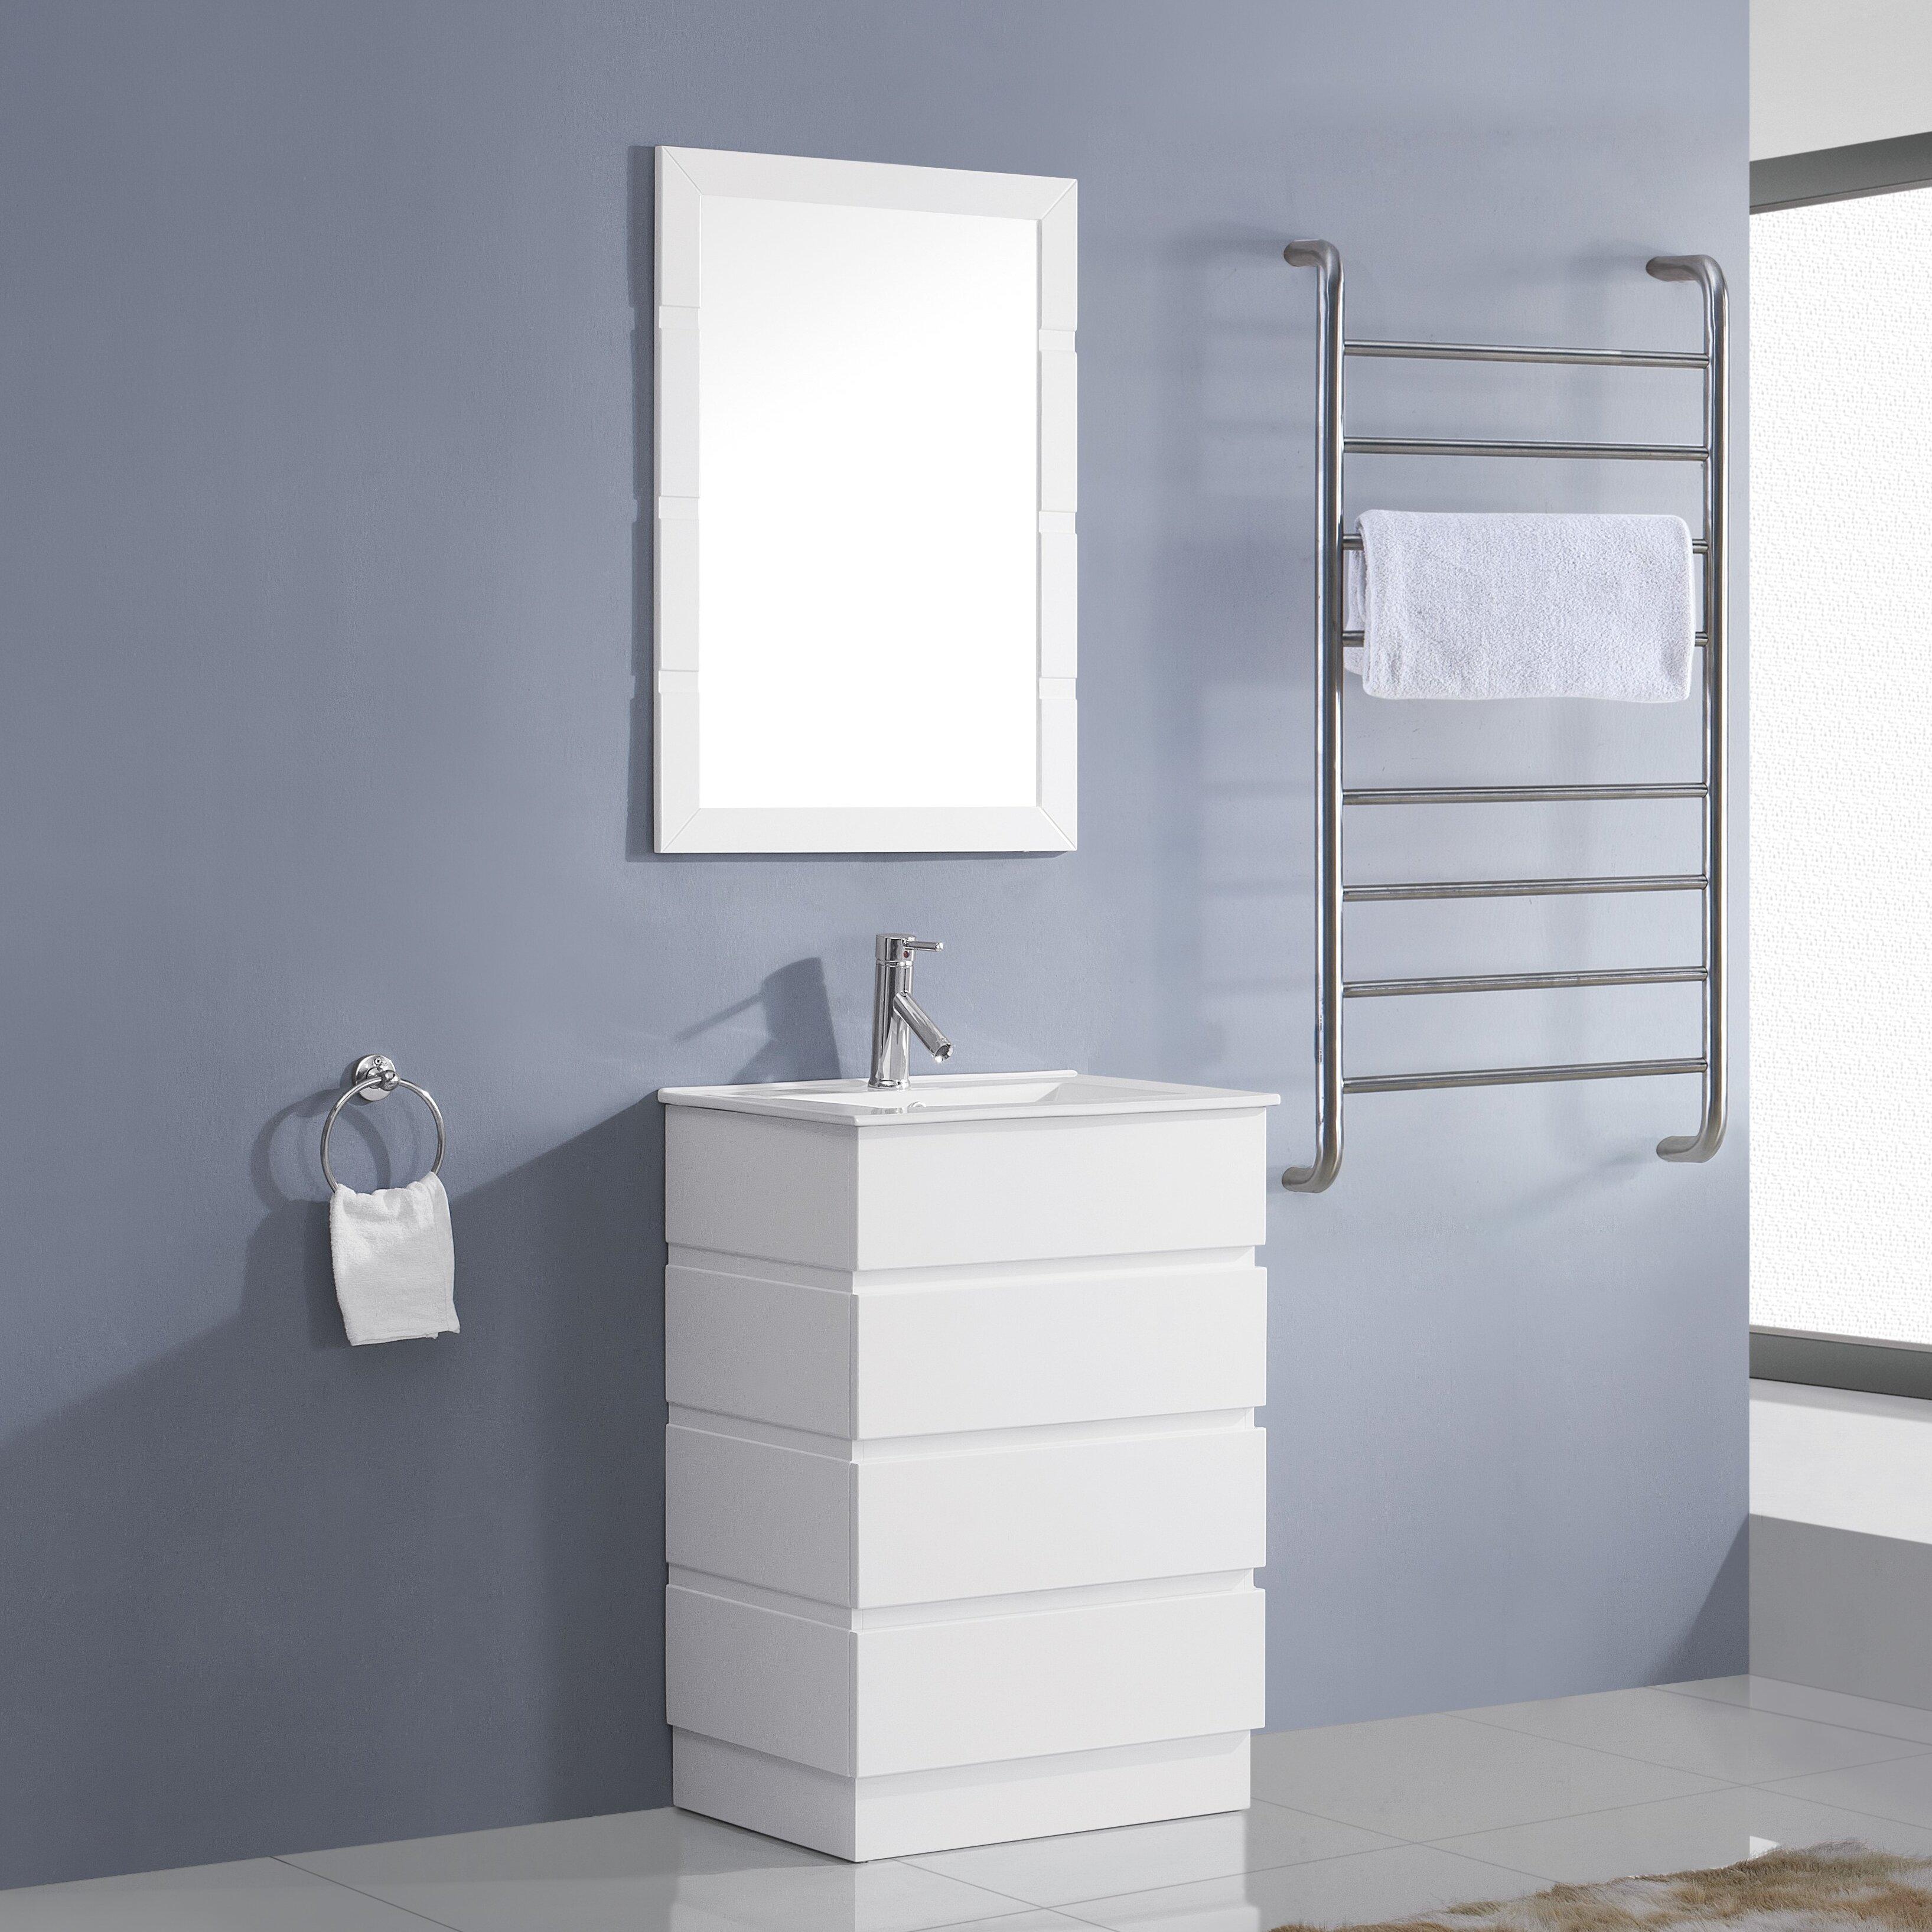 Virtu Bruno 24 Single Contemporary Bathroom Vanity Set With Ceramic Top And Mirror Reviews